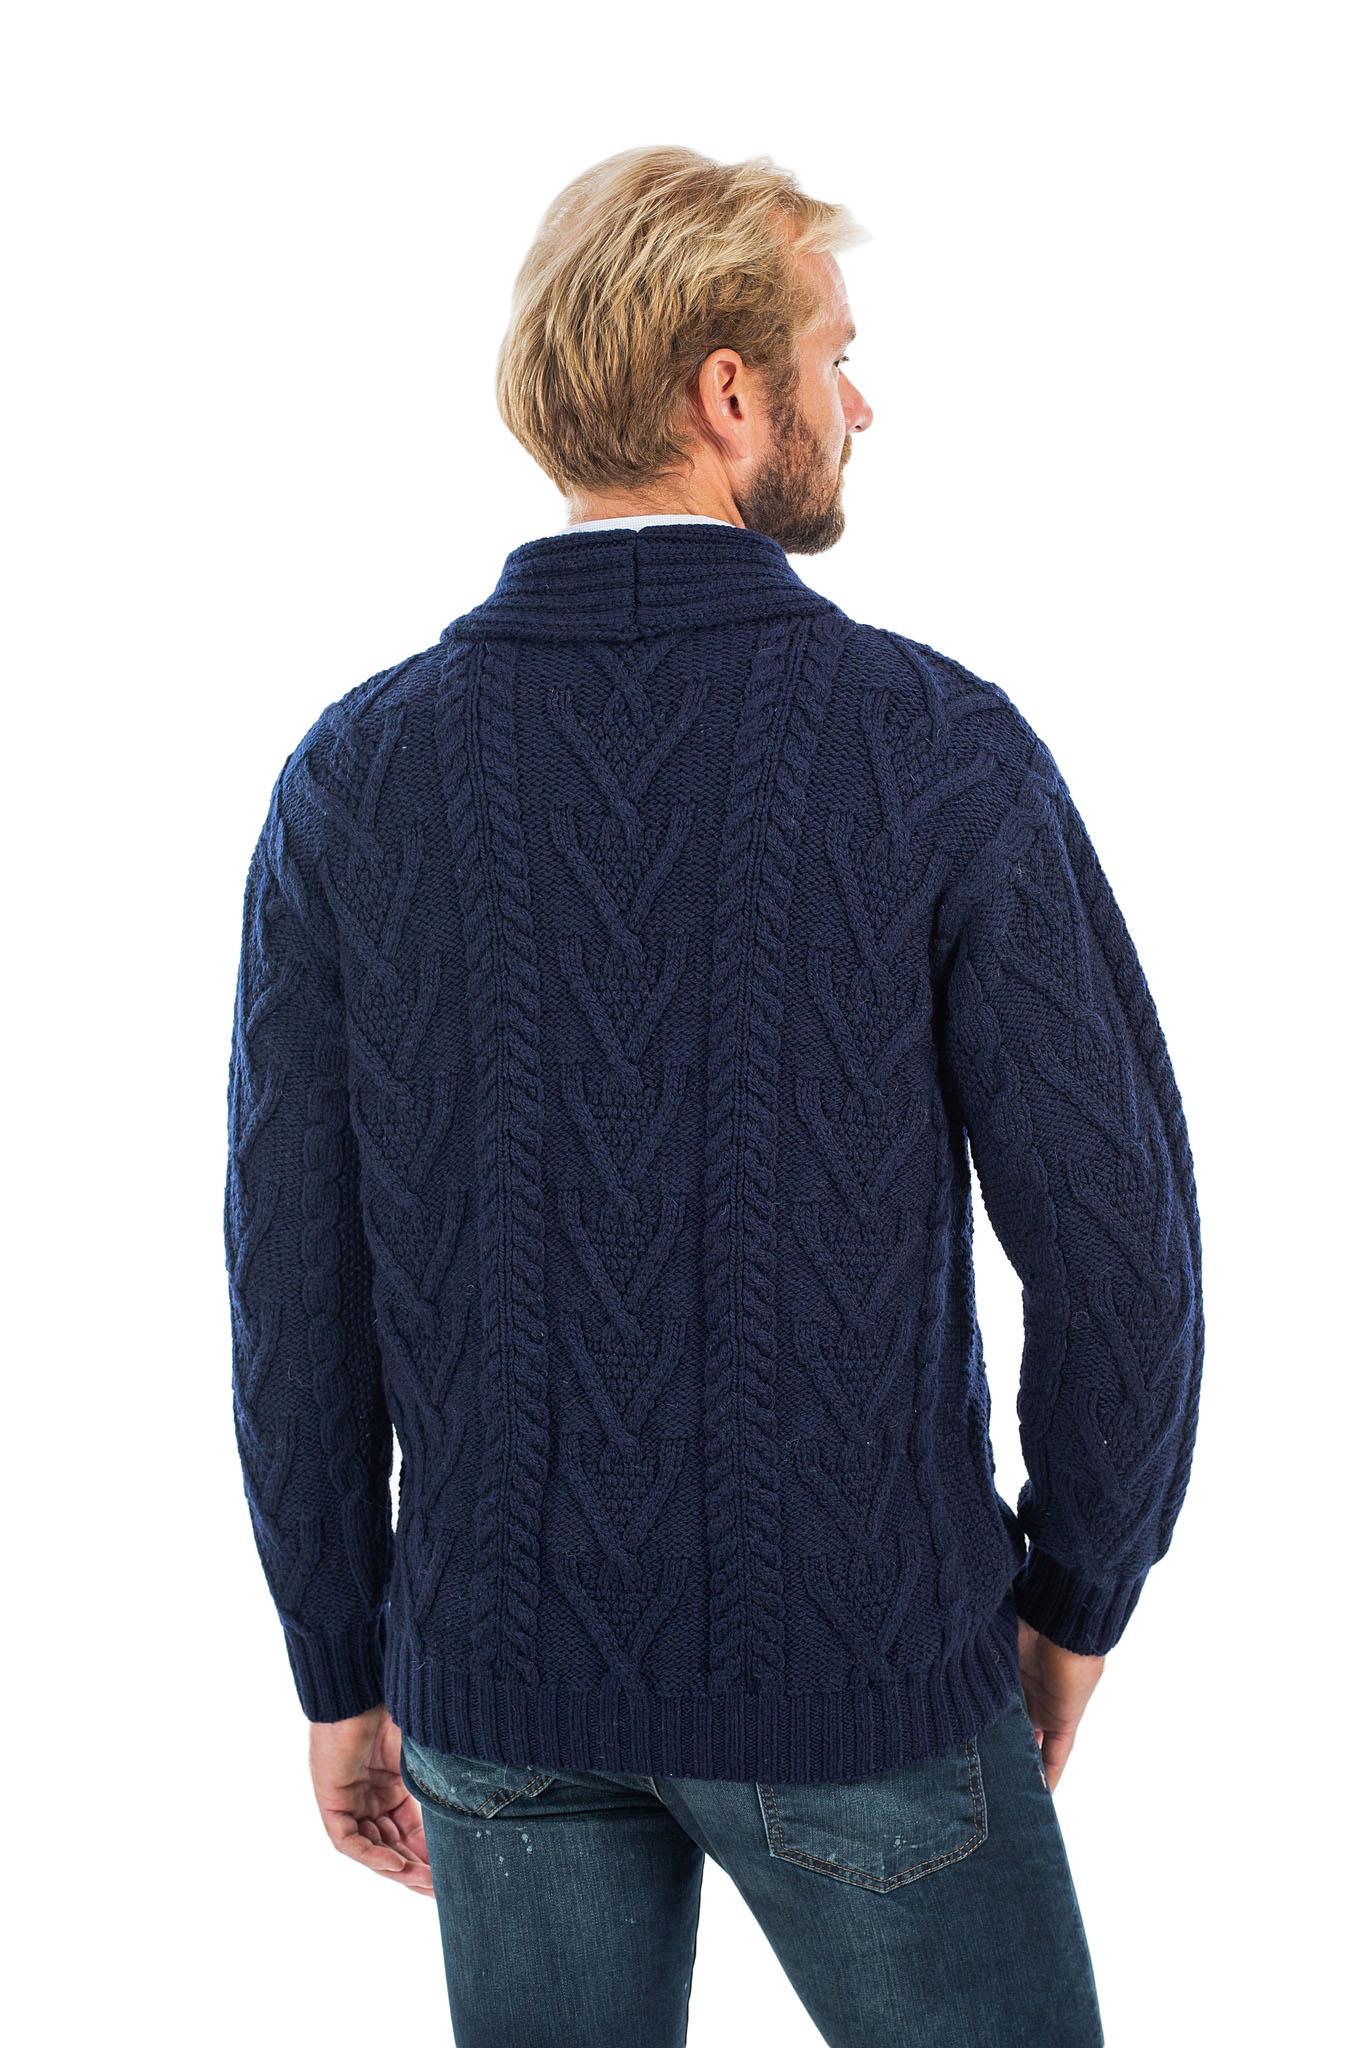 SAOL-Mens-Irish-Merino-Wool-Cardigan-Shawl-Collar-Front-Pockets-Aran-Cable-Knit thumbnail 23